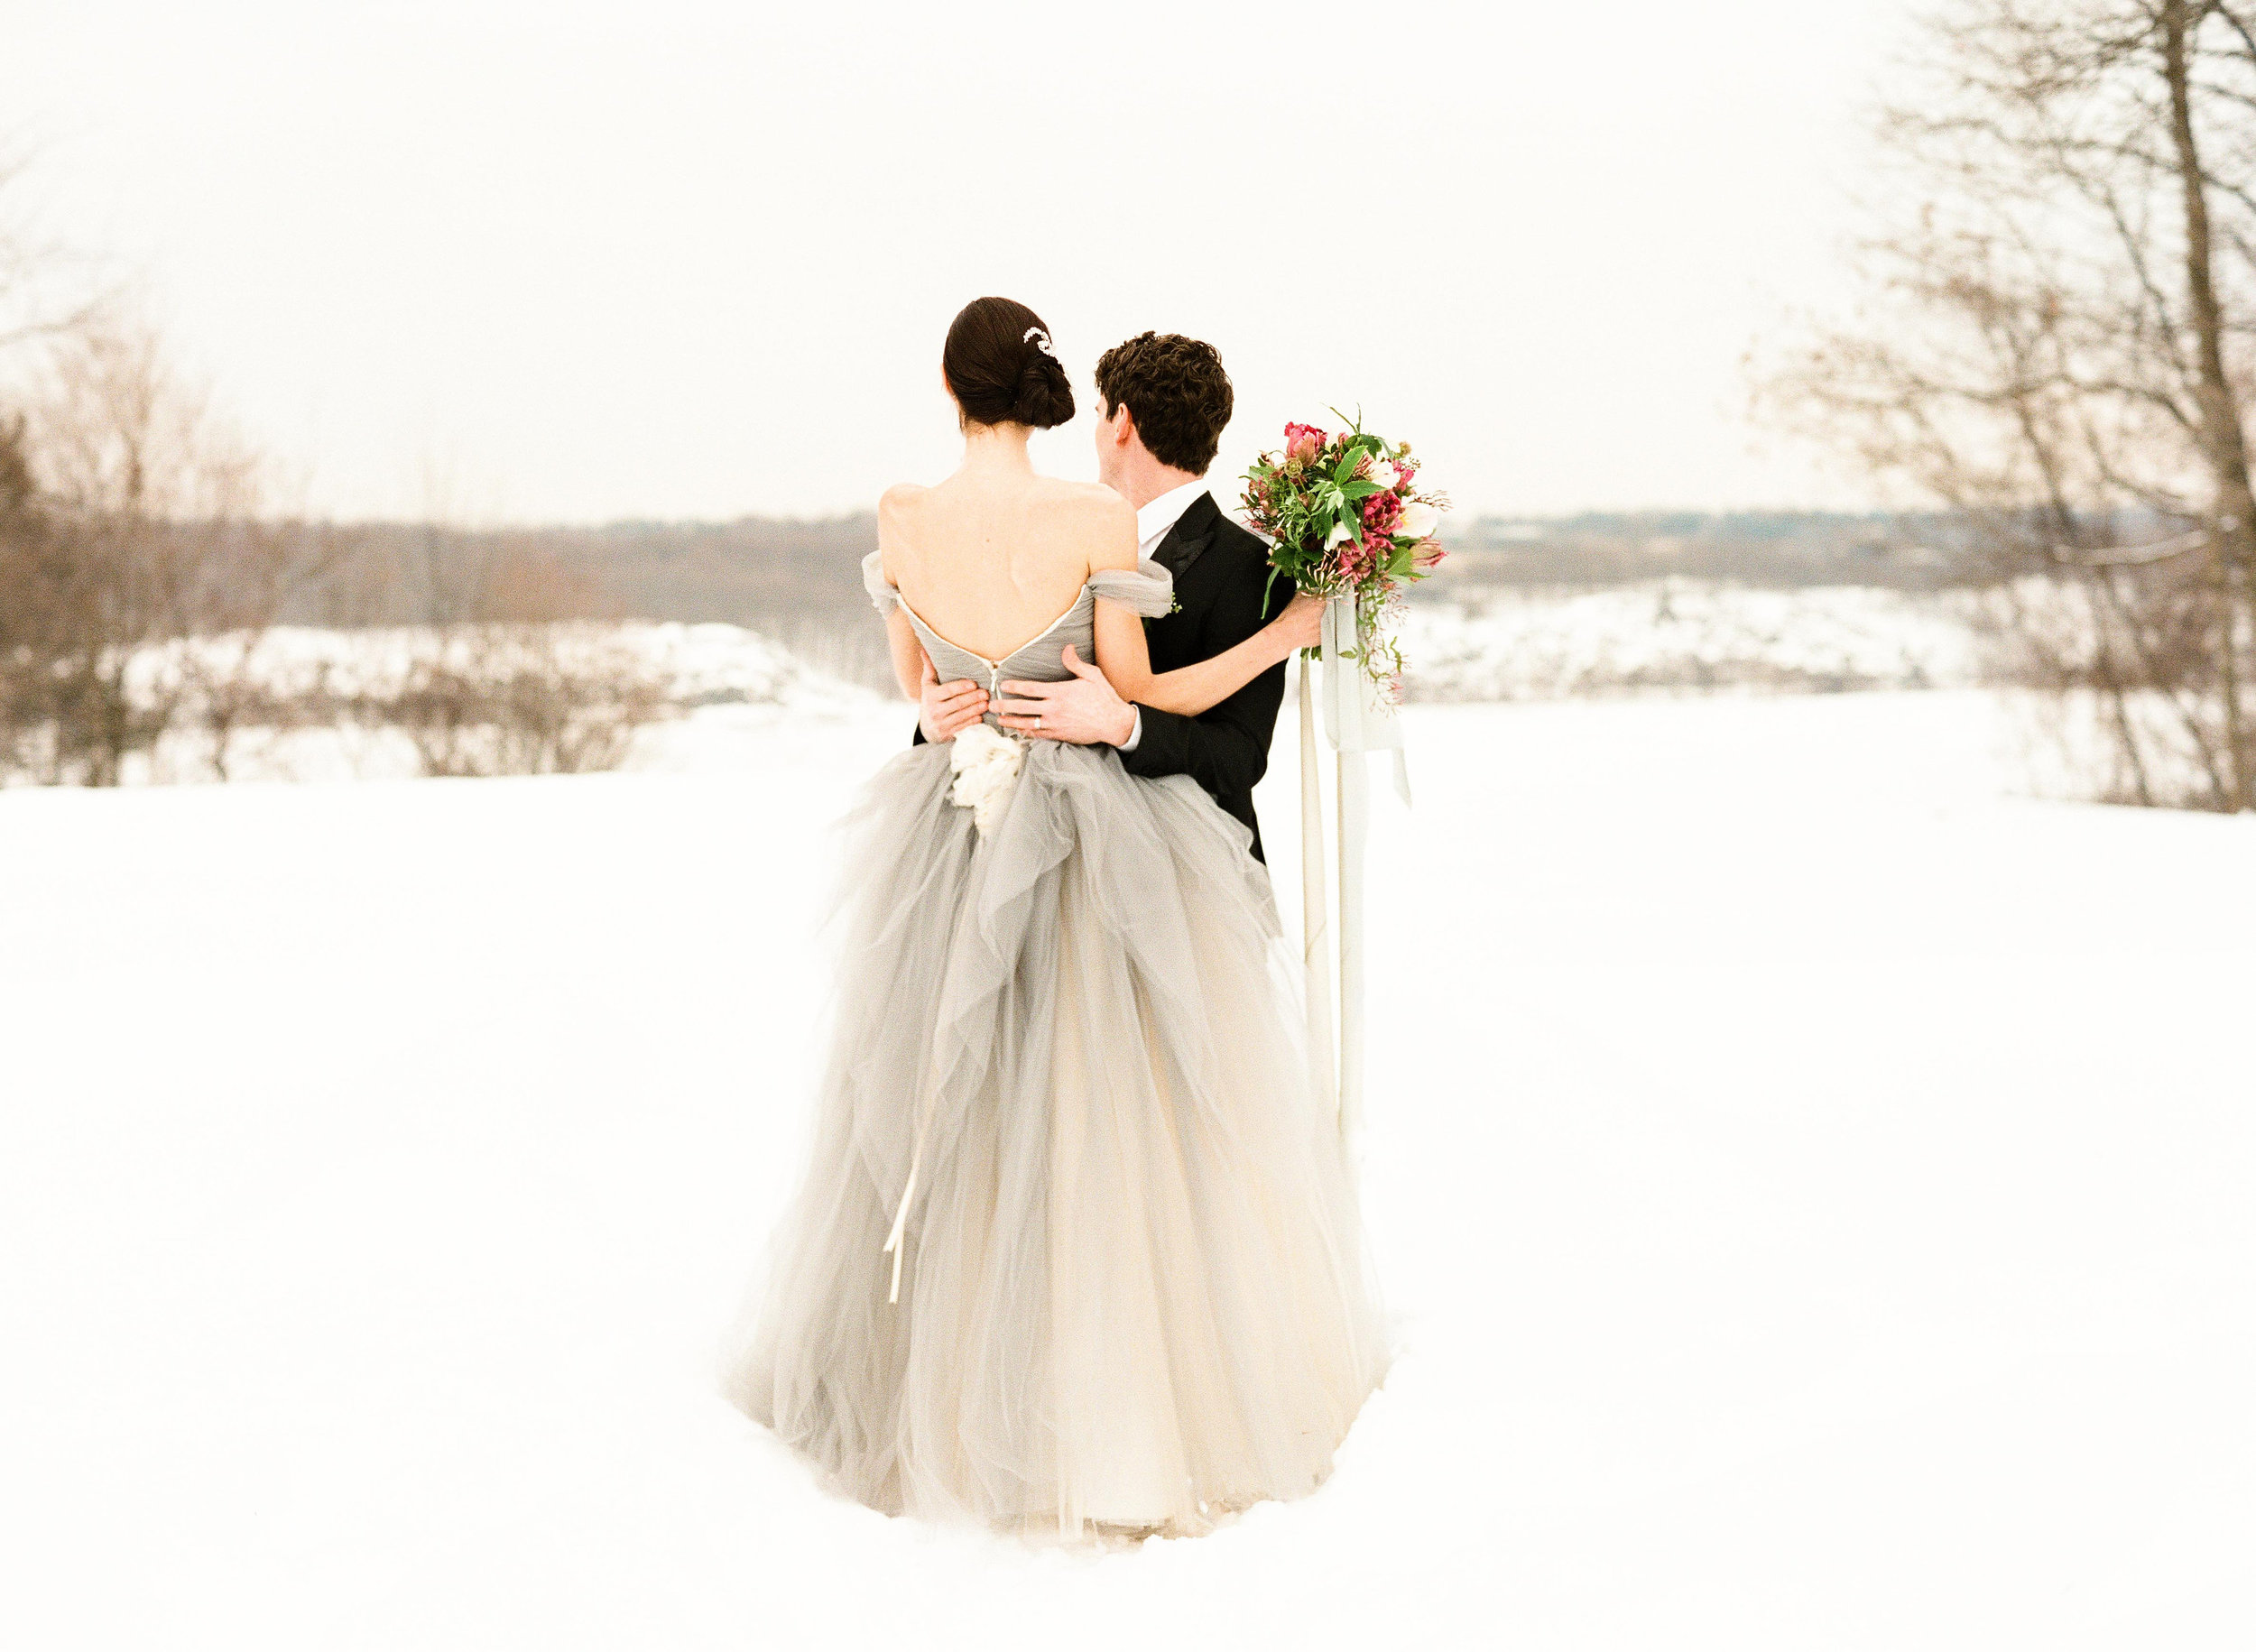 WinterEditorial-SarehNouri-LindsayMaddenPhotography-34.JPG